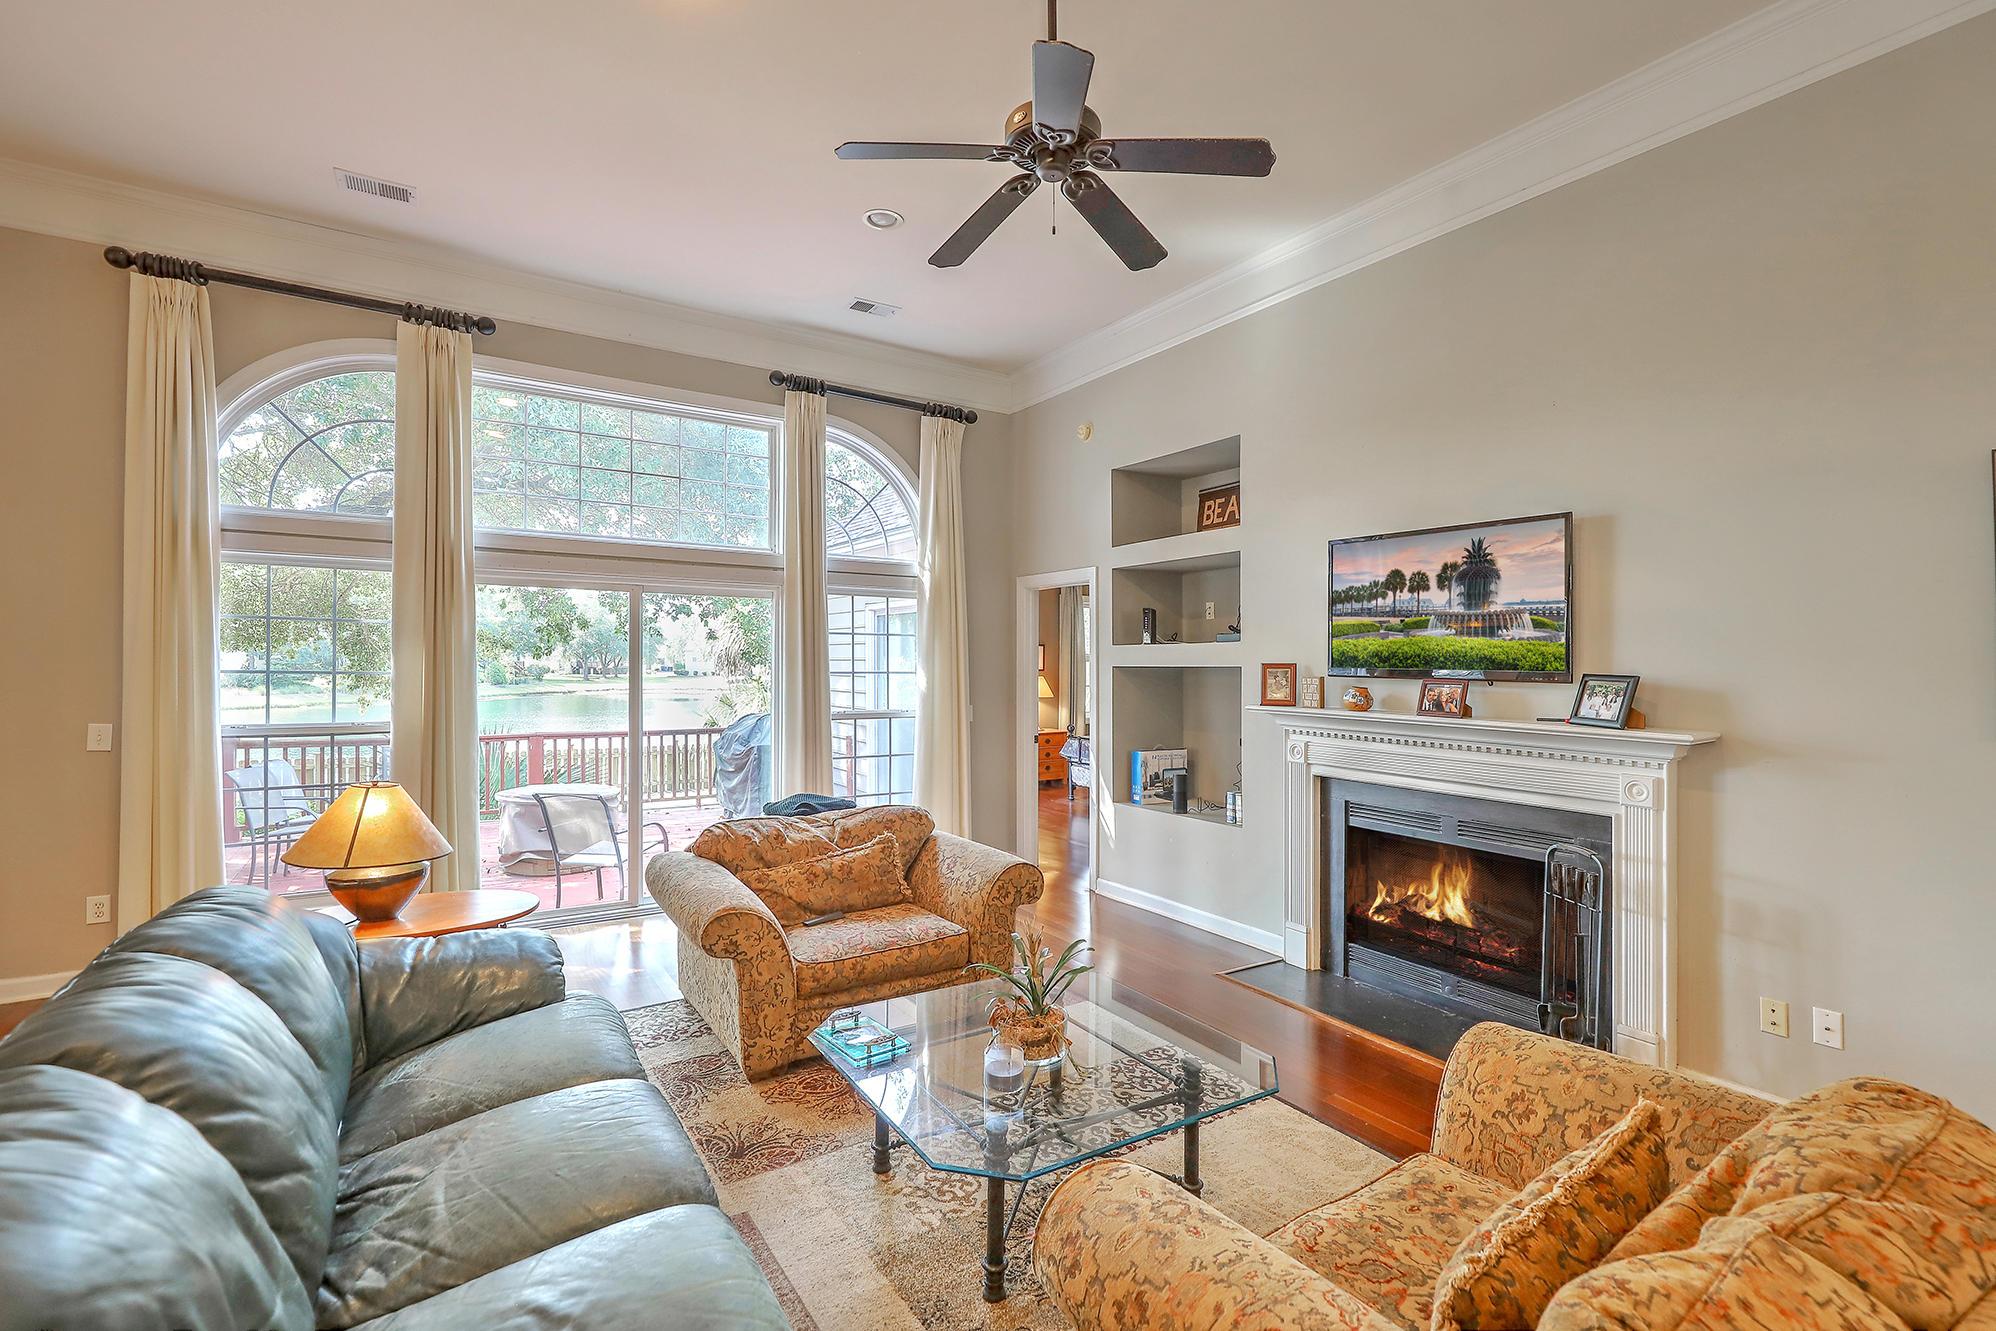 Seaside Farms Homes For Sale - 1244 Palmetto Peninsula, Mount Pleasant, SC - 4